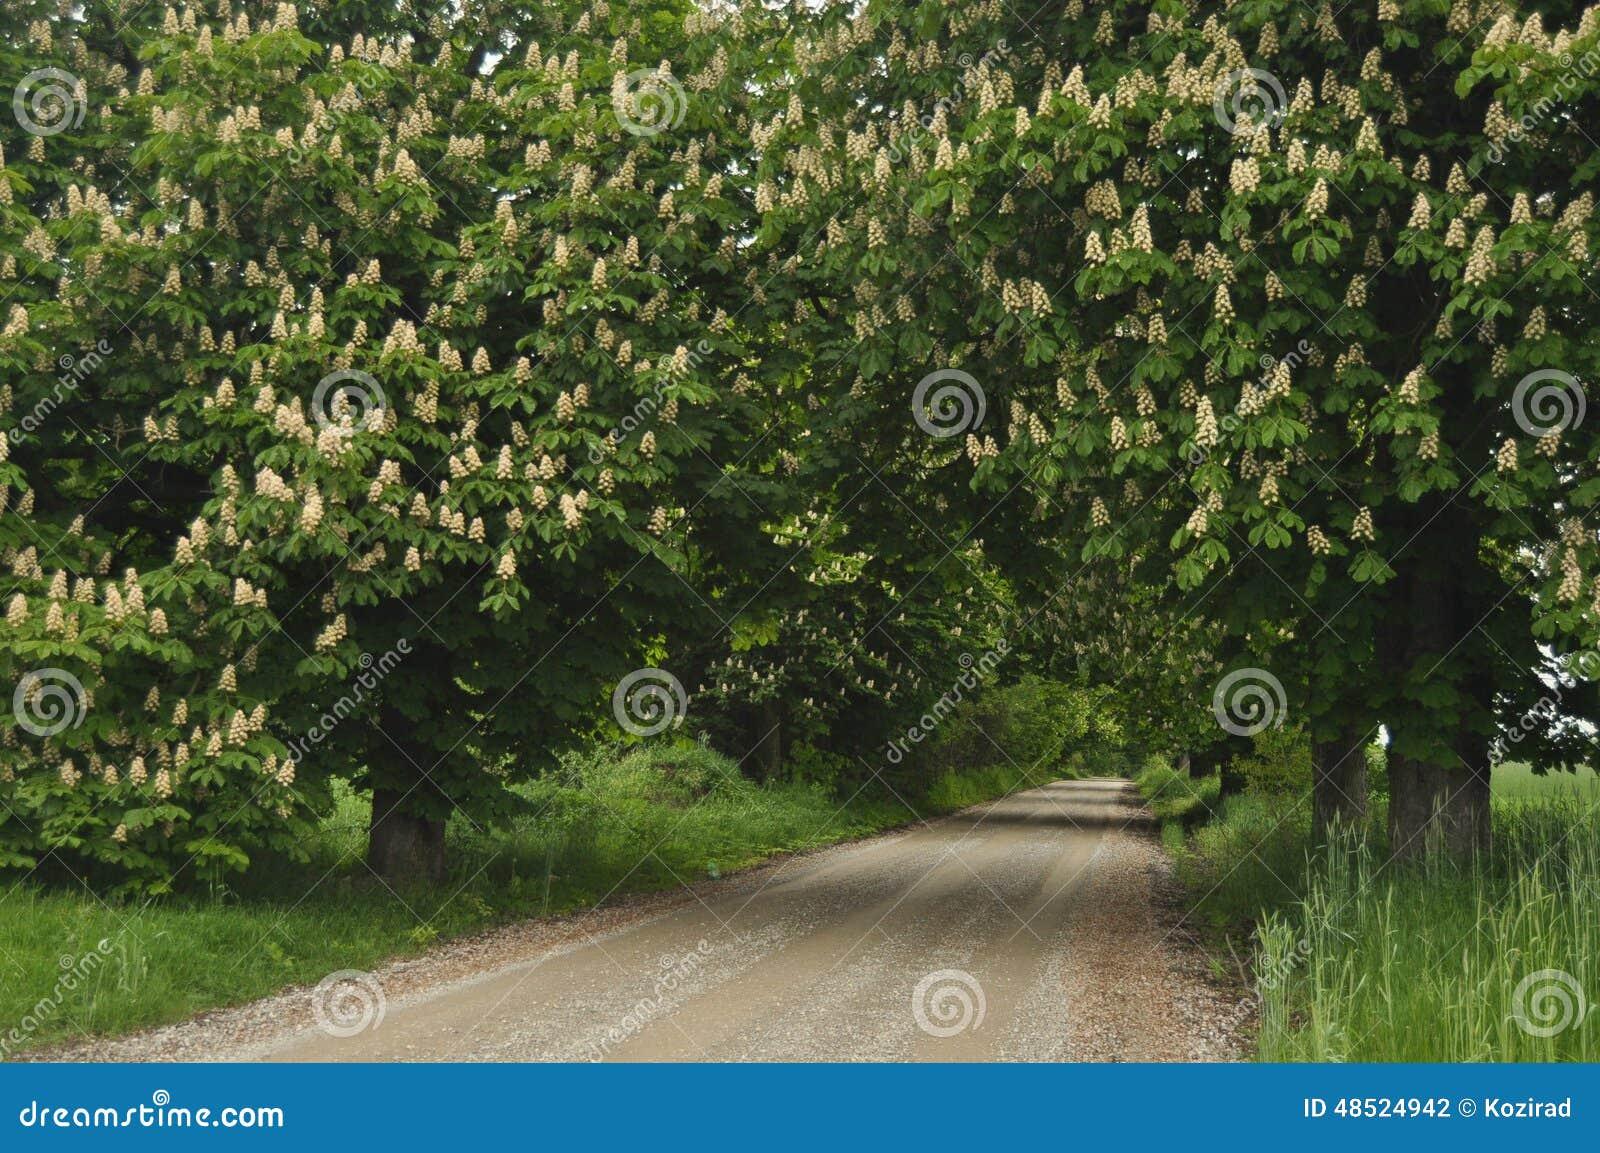 Blooming Chestnut Trees Along The Gravel Road Spring White Flowers